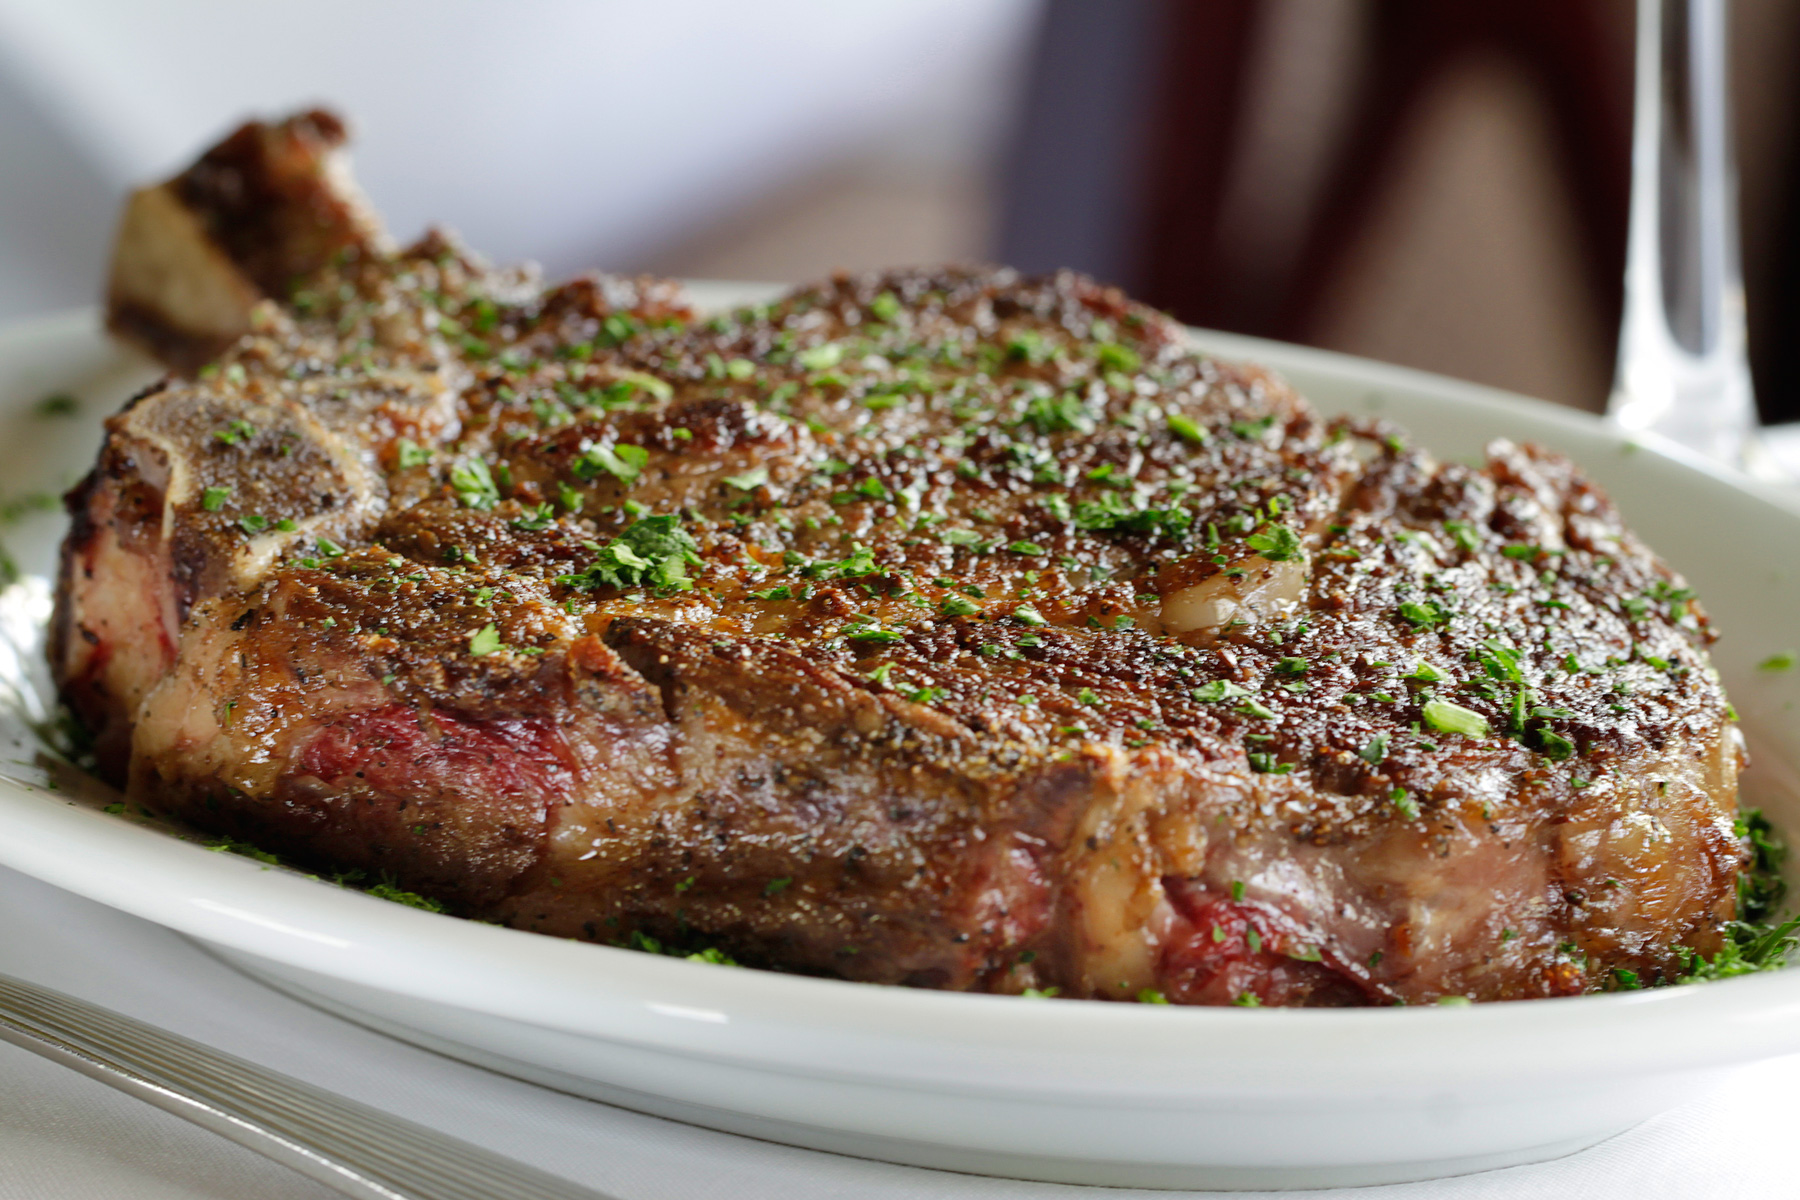 Best steak sunday swinging seems impossible